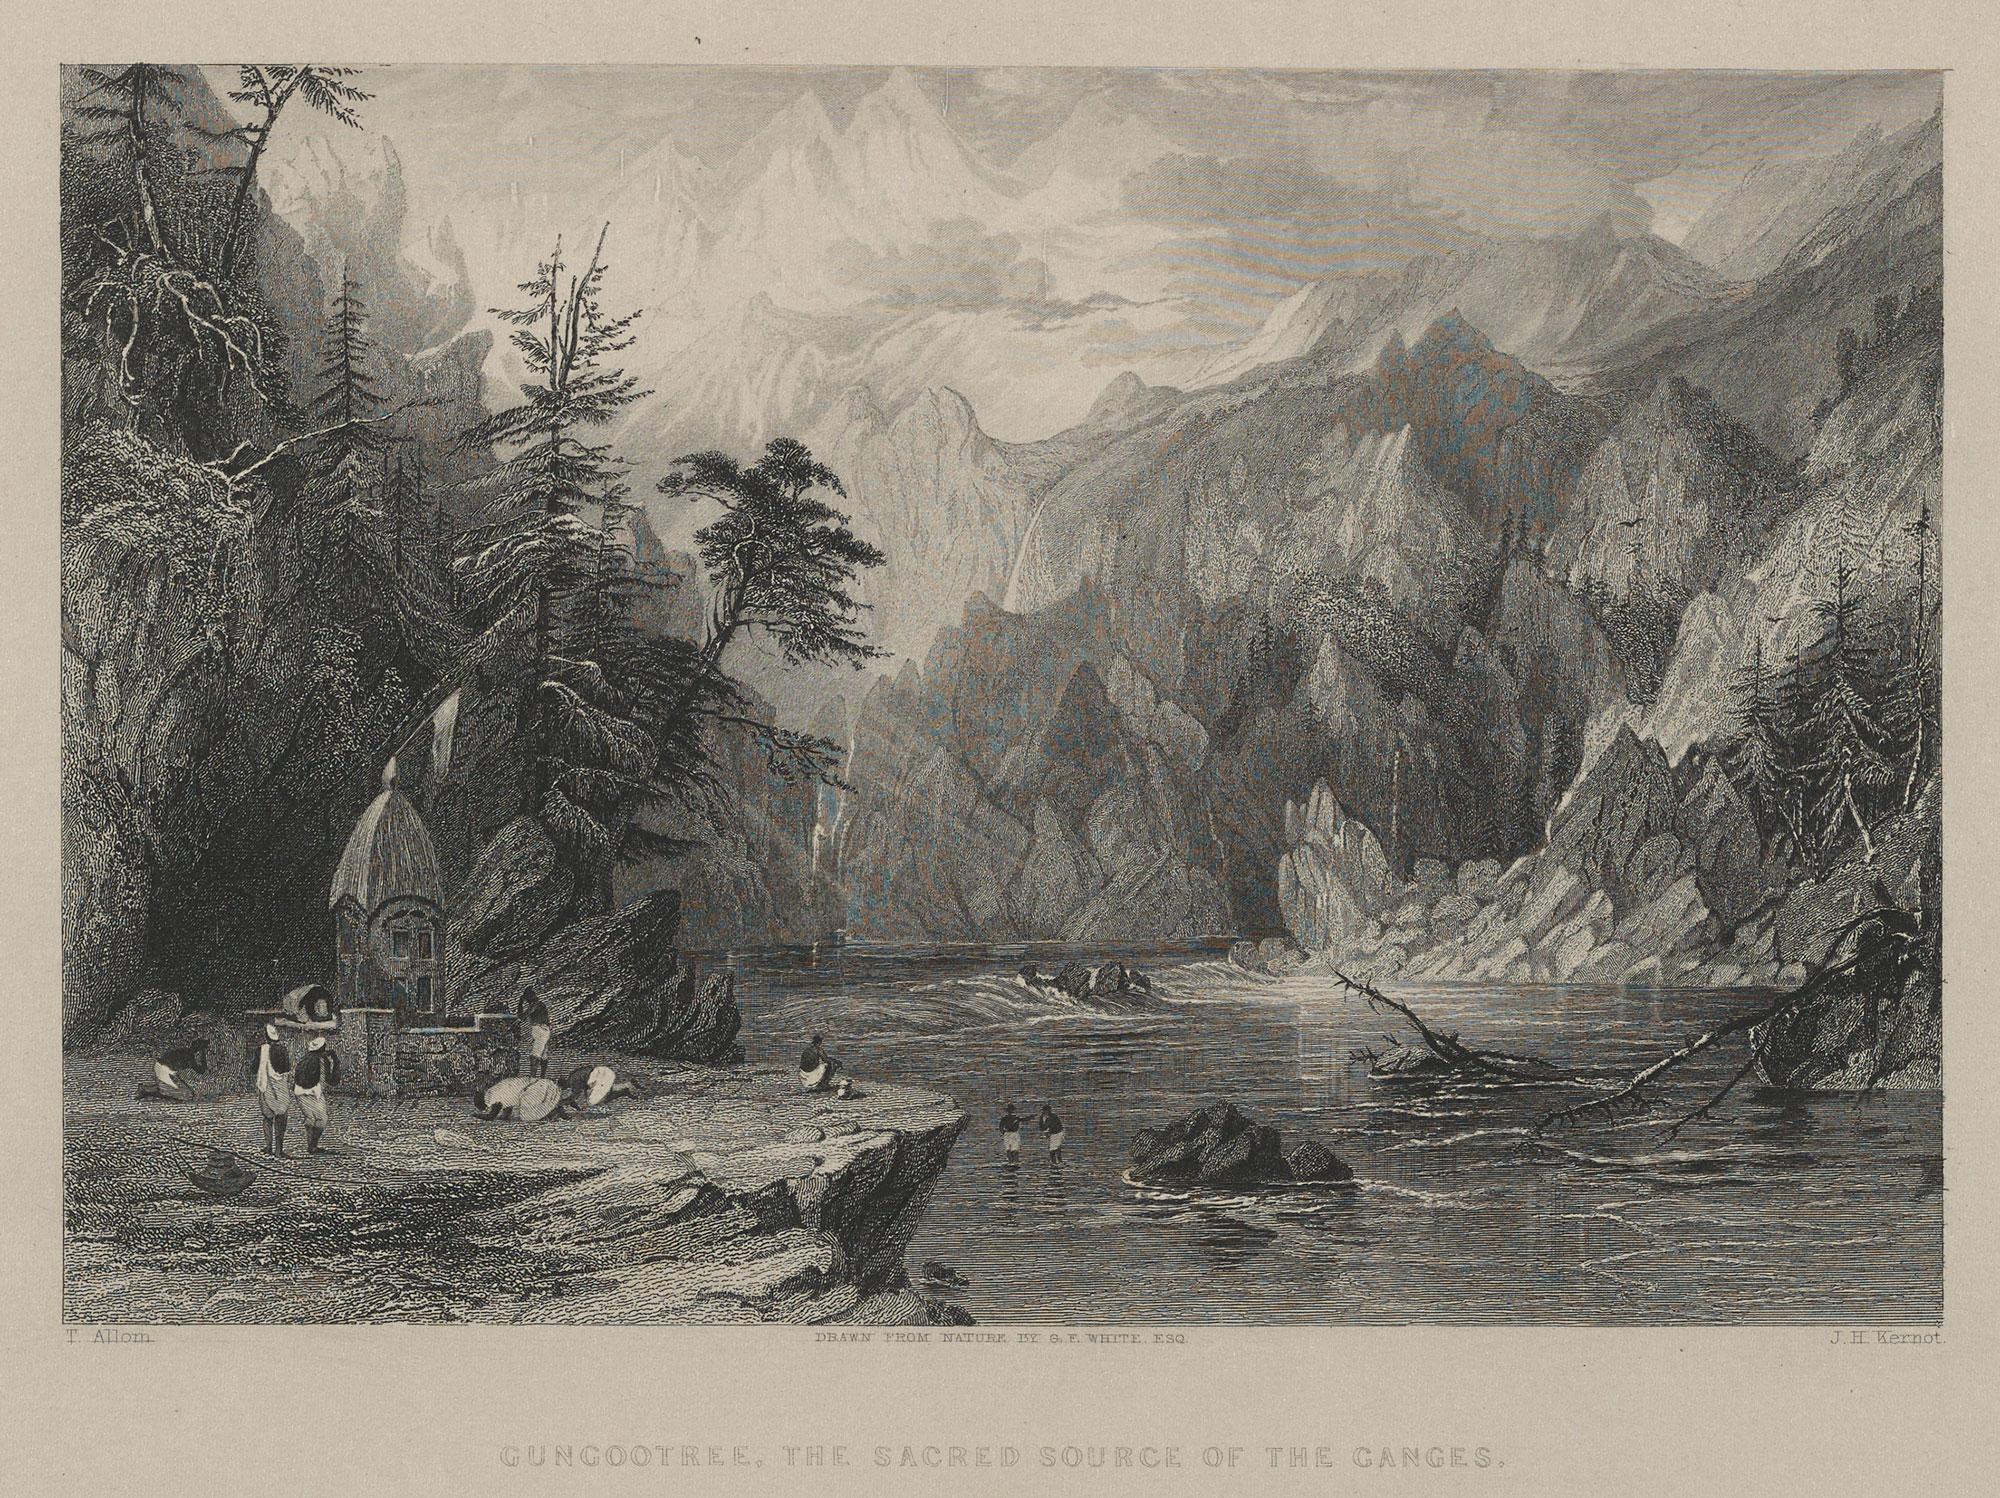 19_GF-White_Gungotree_1838-Penn.jpg